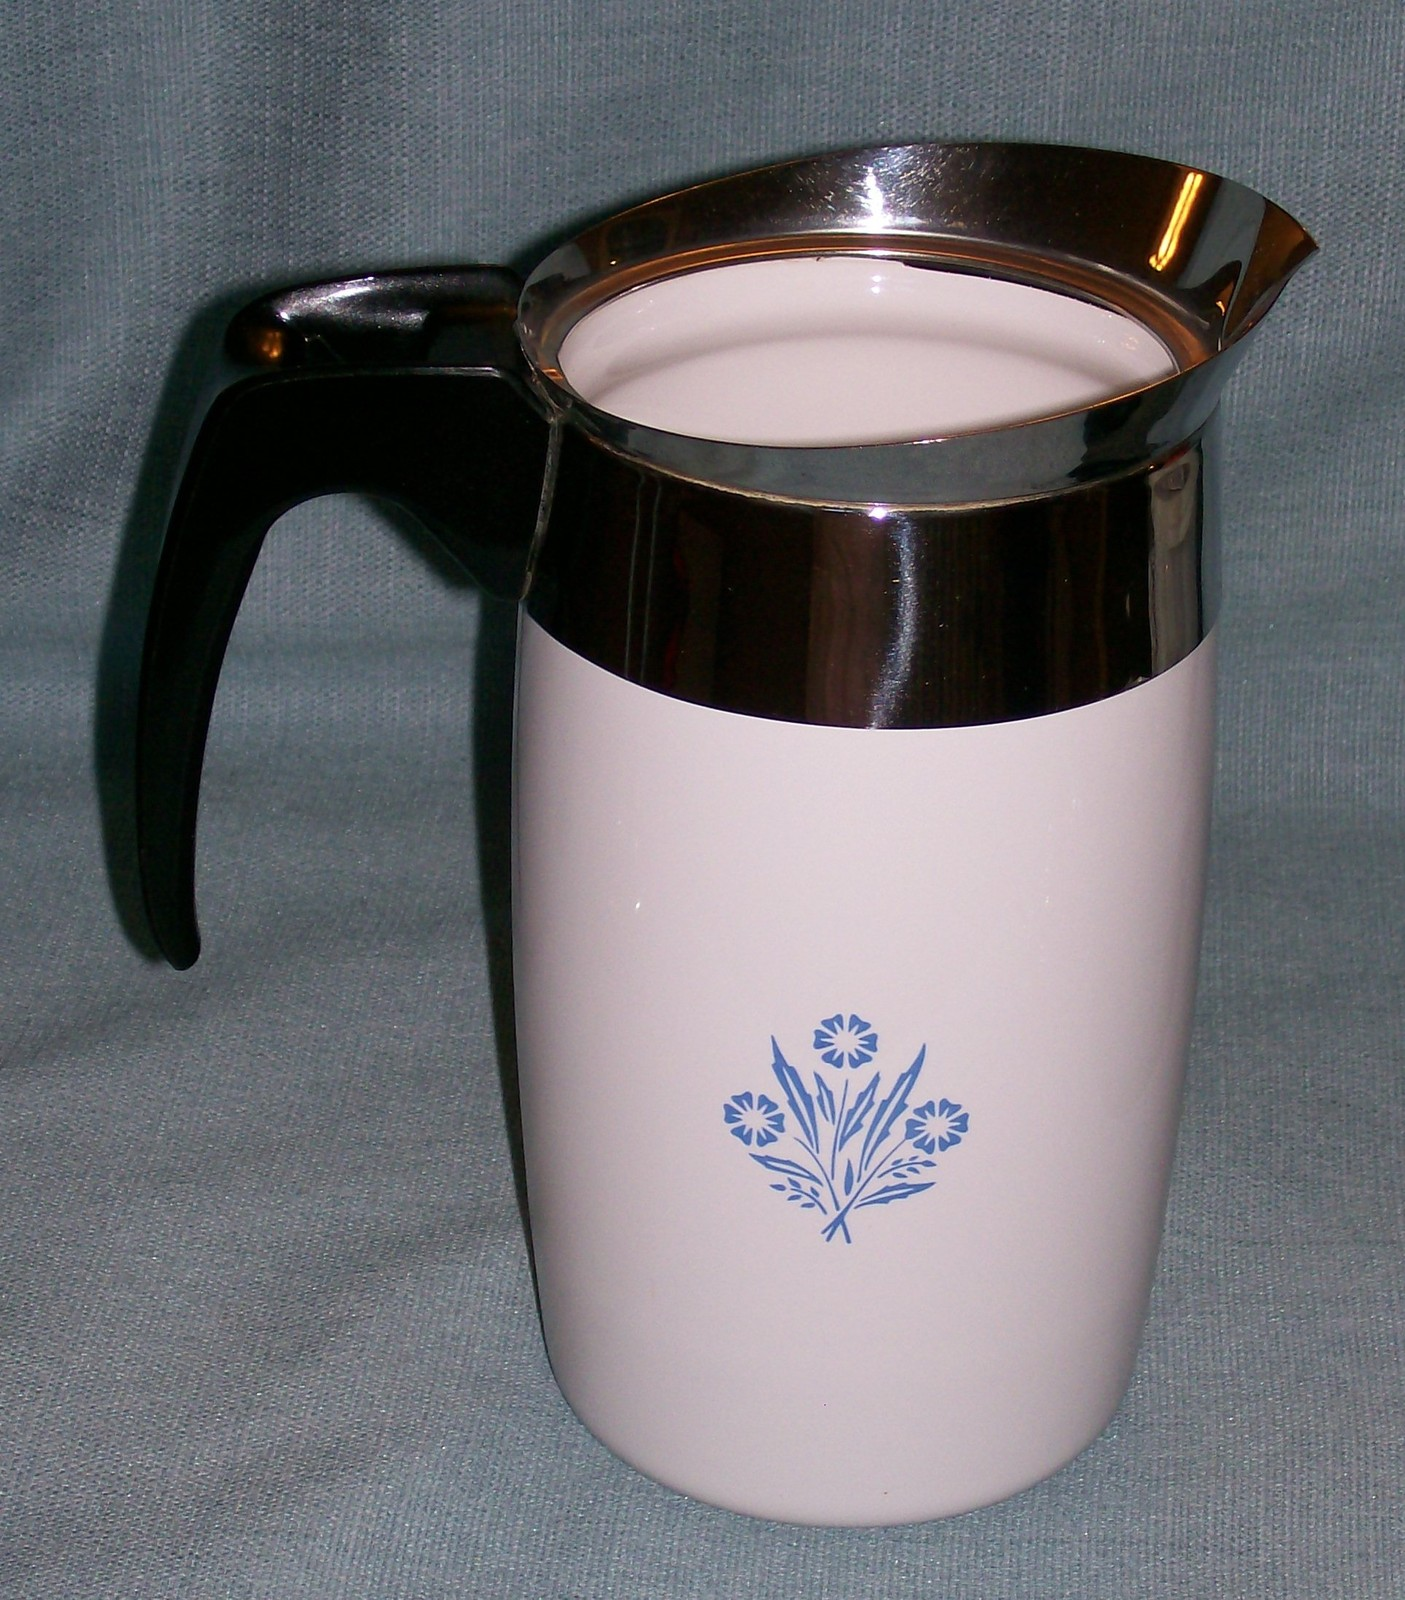 Corning Ware BLUE CORNFLOWER Electric Coffee Pot/Percolator 6 cup P-6-EP VGVC  image 2